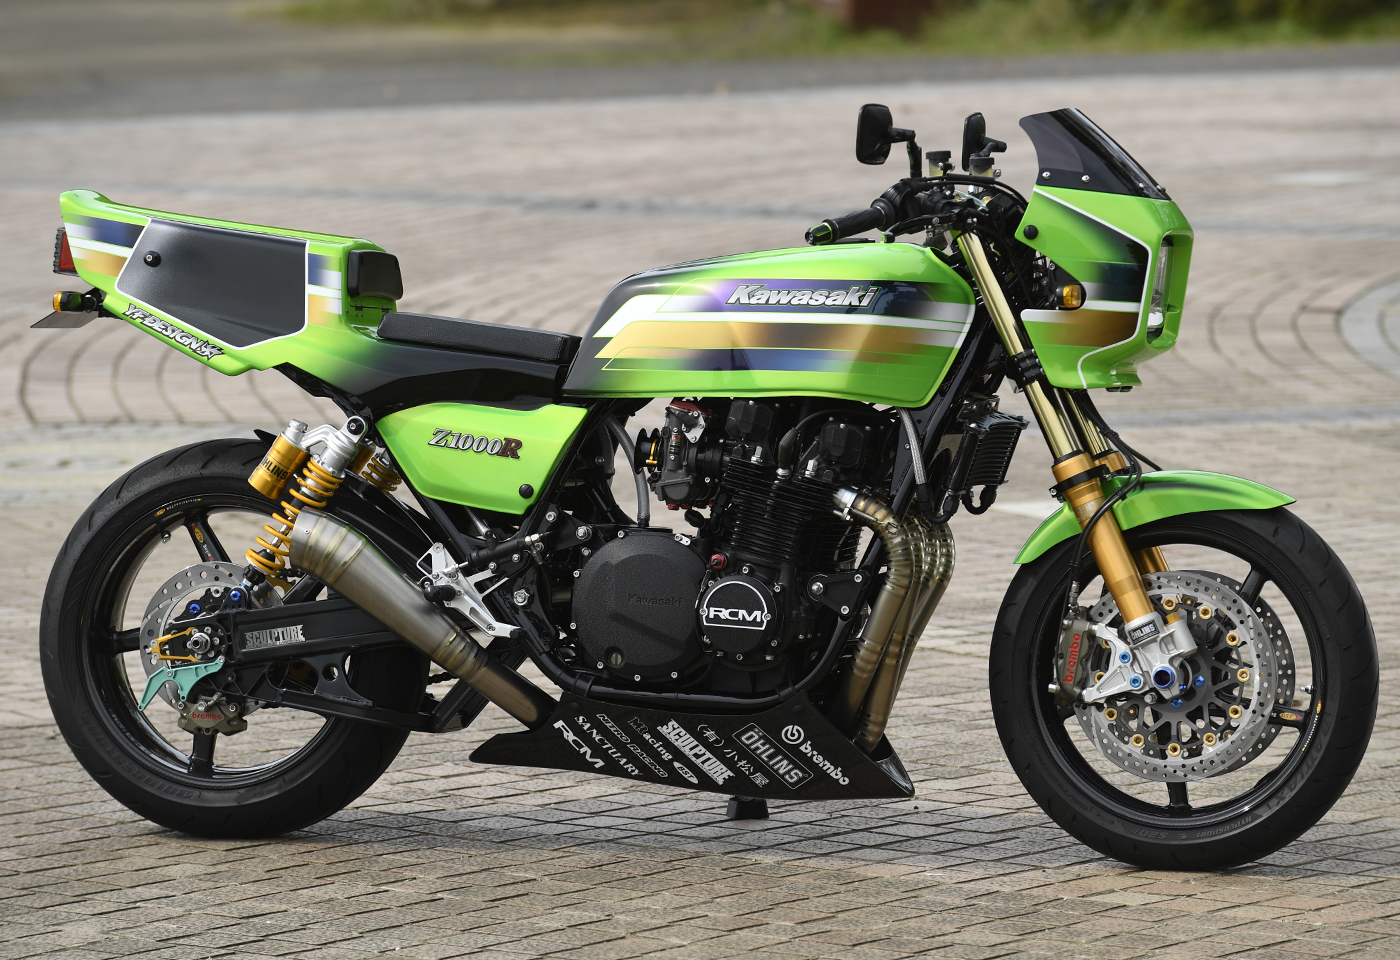 EICMA 2017 - Kawasaki dévoile une Z900 RS Cafe.